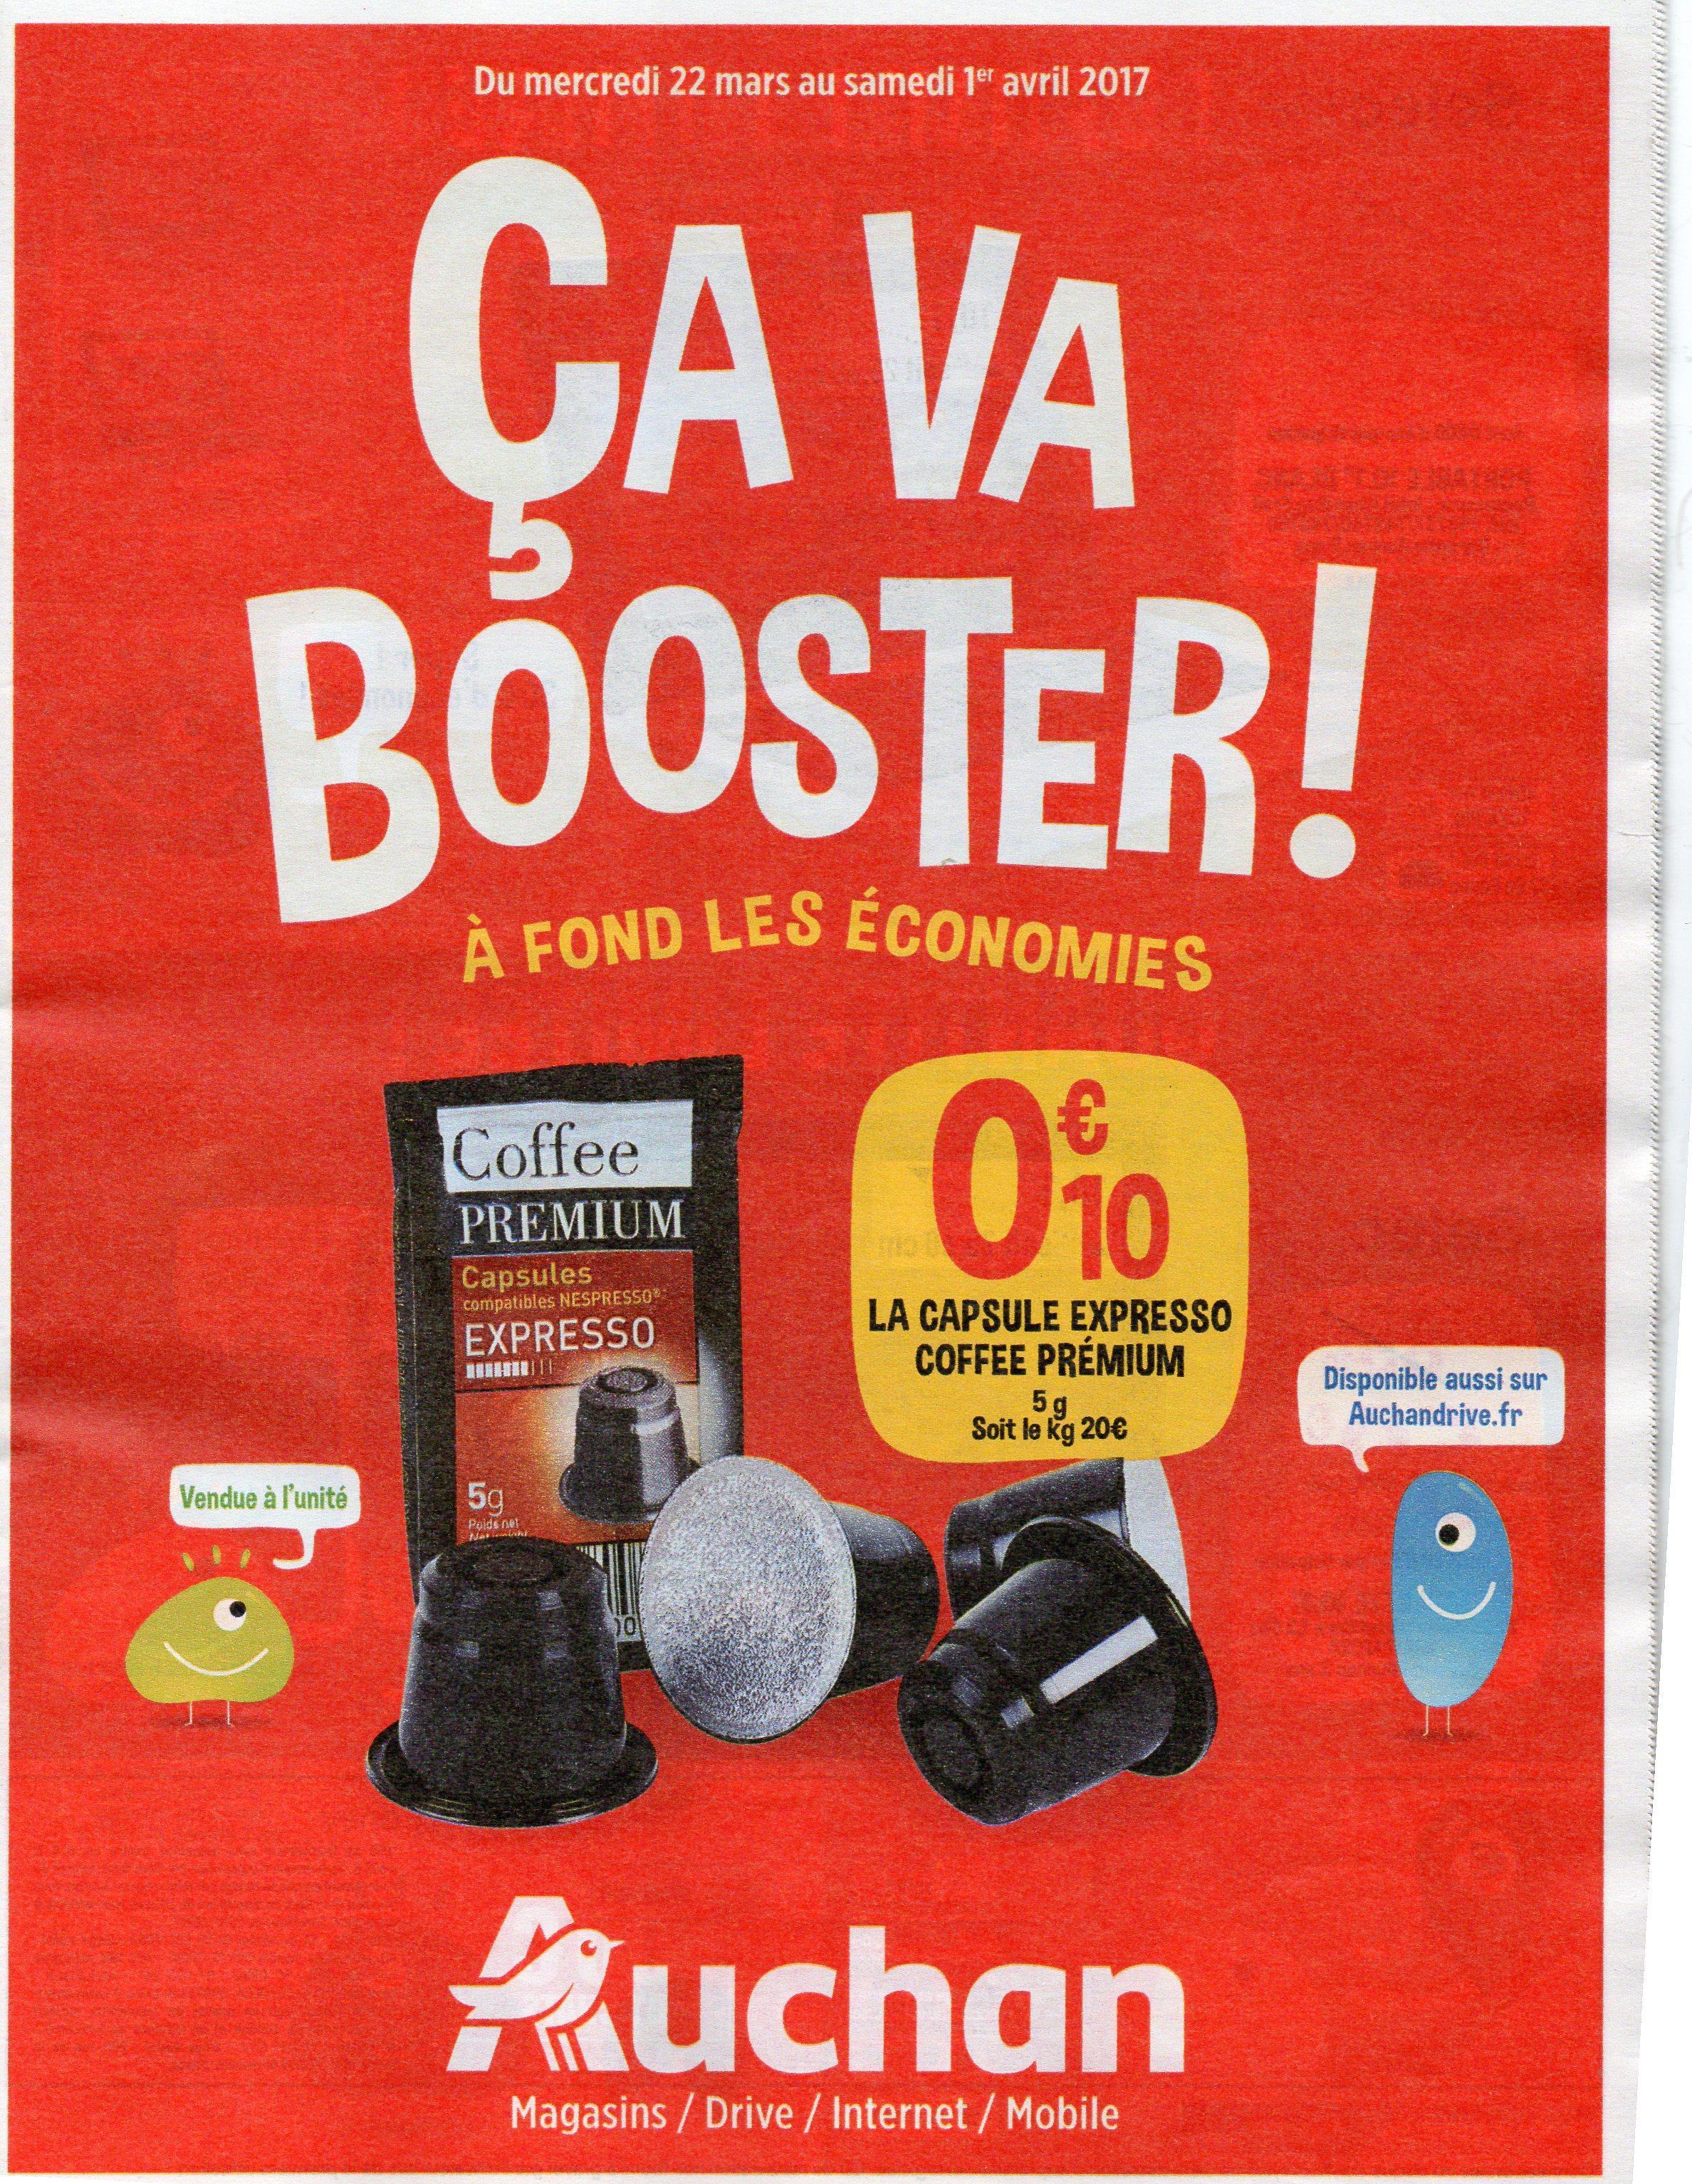 Bon reduction nespresso